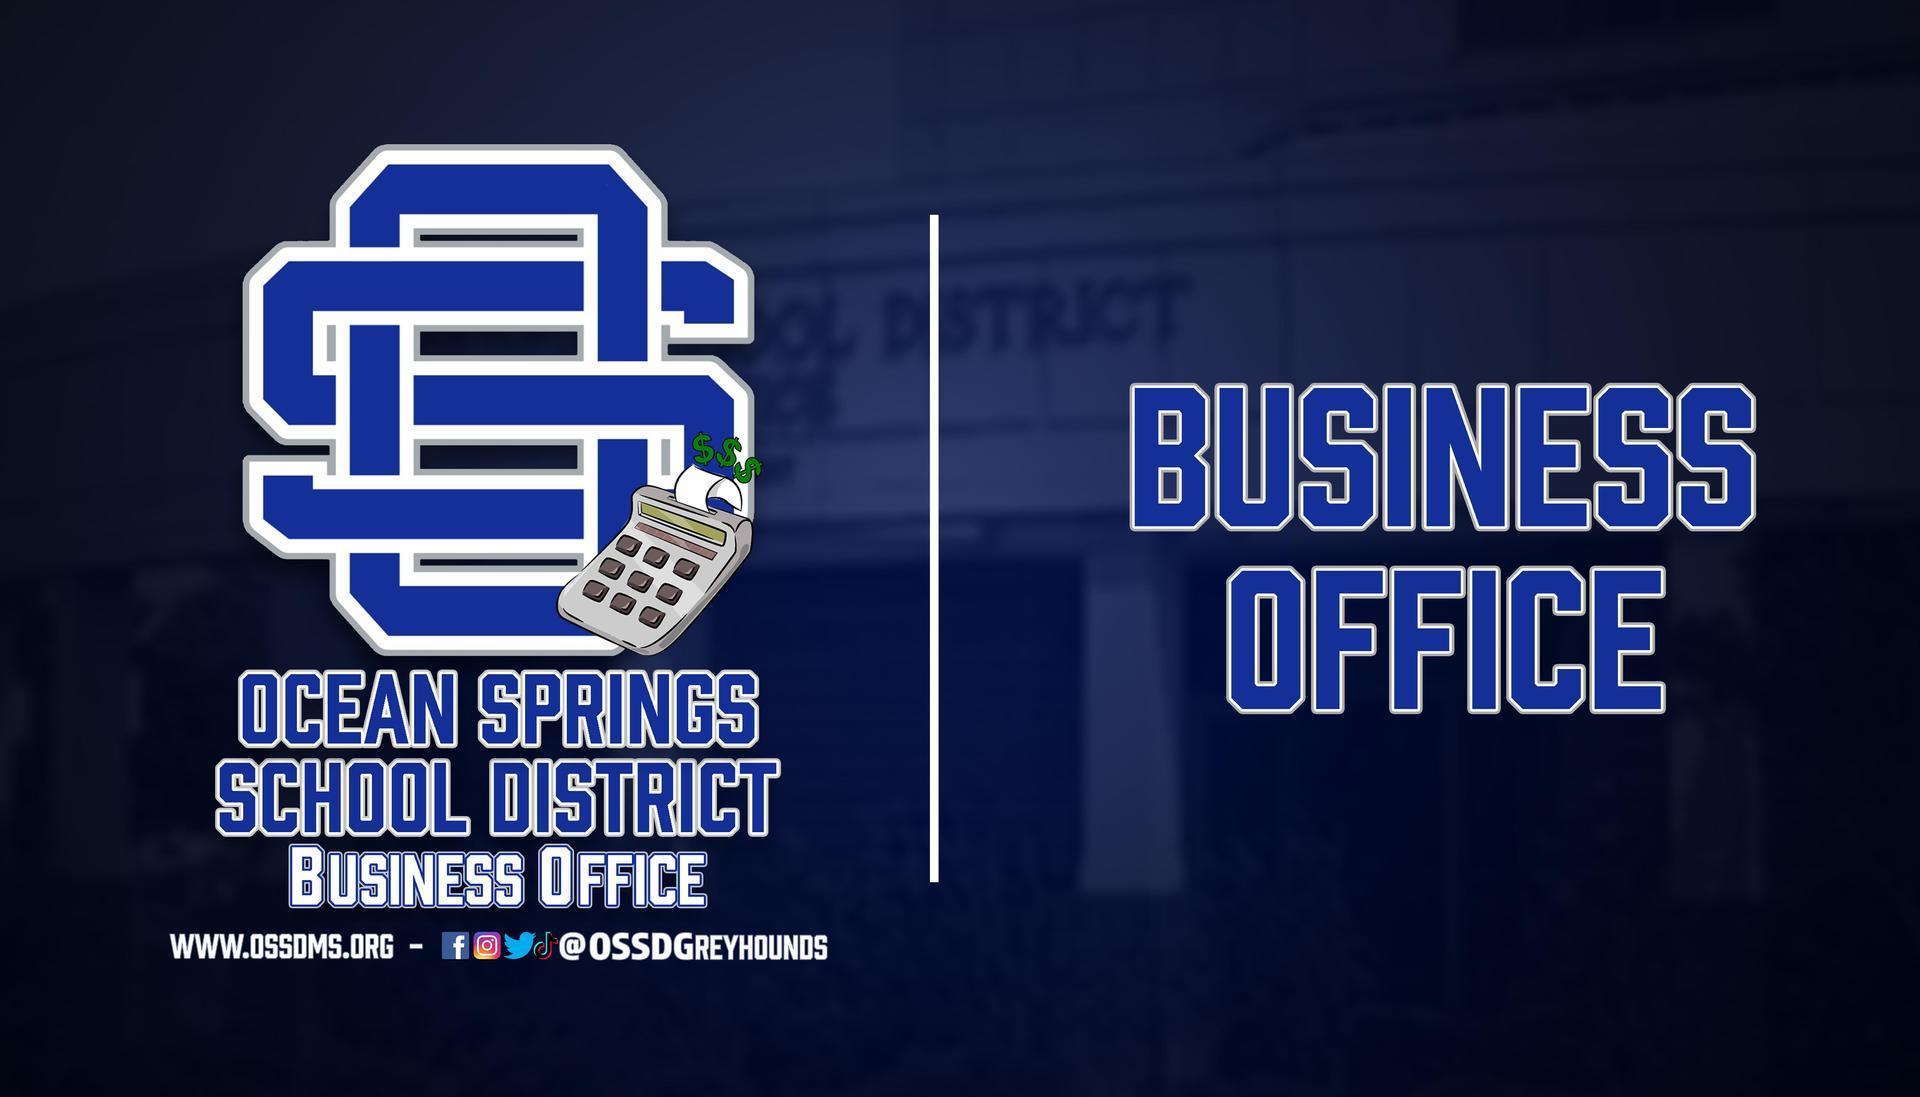 Business Office Header